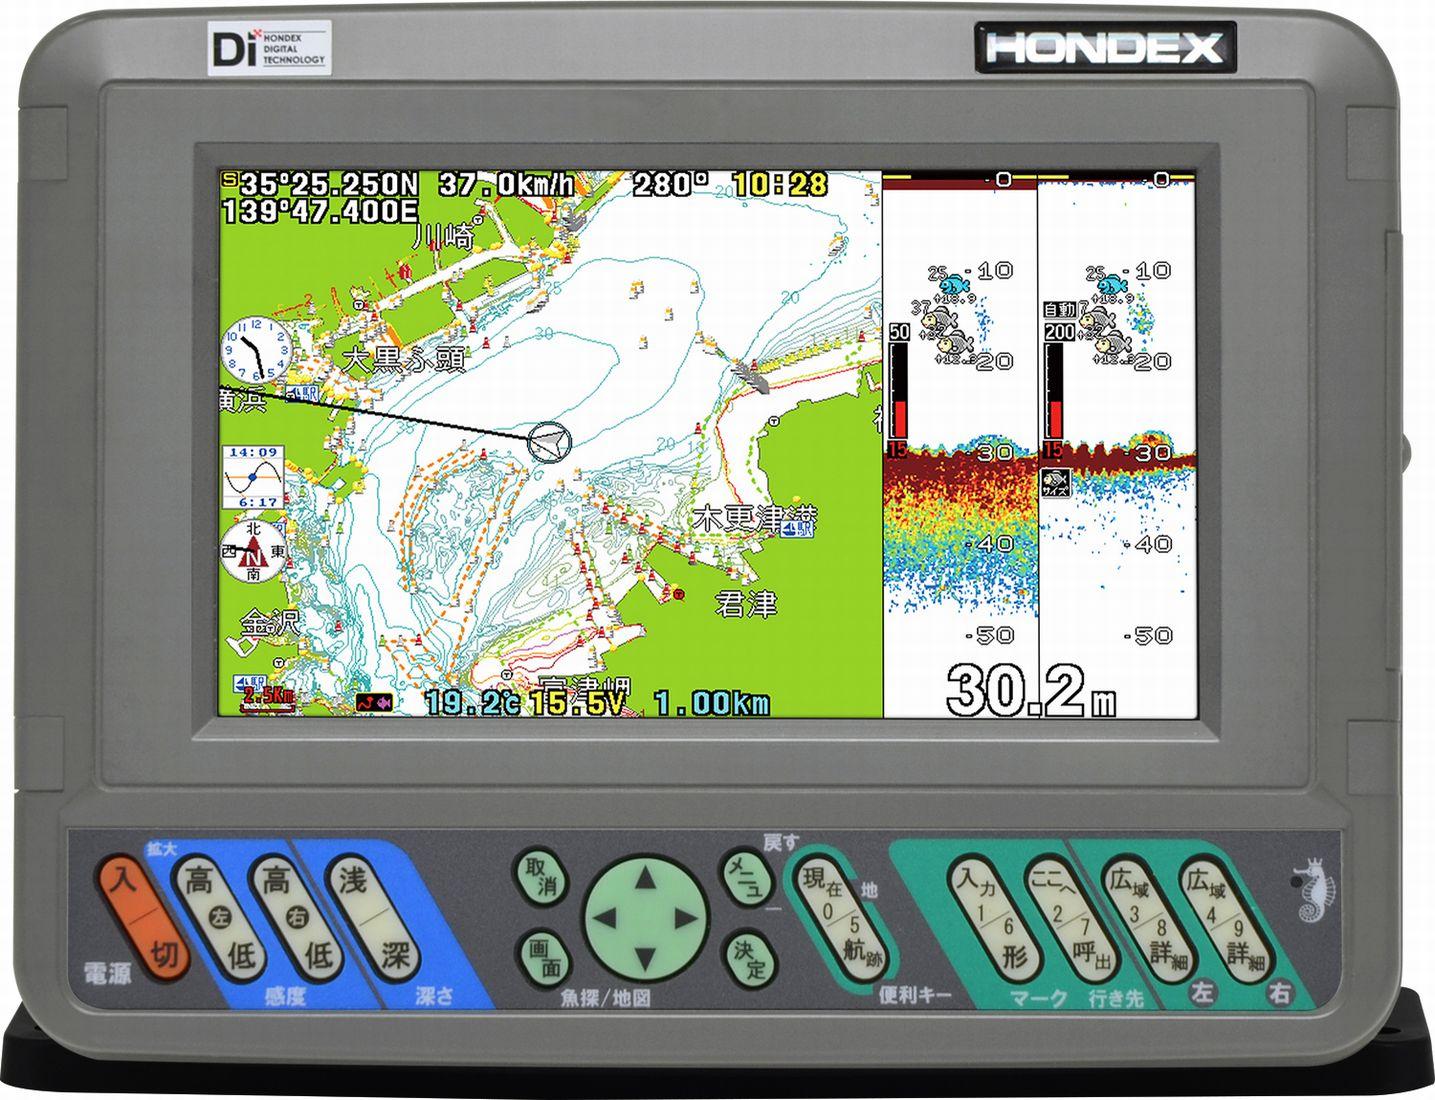 HONDEX (ホンデックス) PS-700GP-Di 7型ワイドカラー液晶ポータブルGPS内蔵プロッター魚探